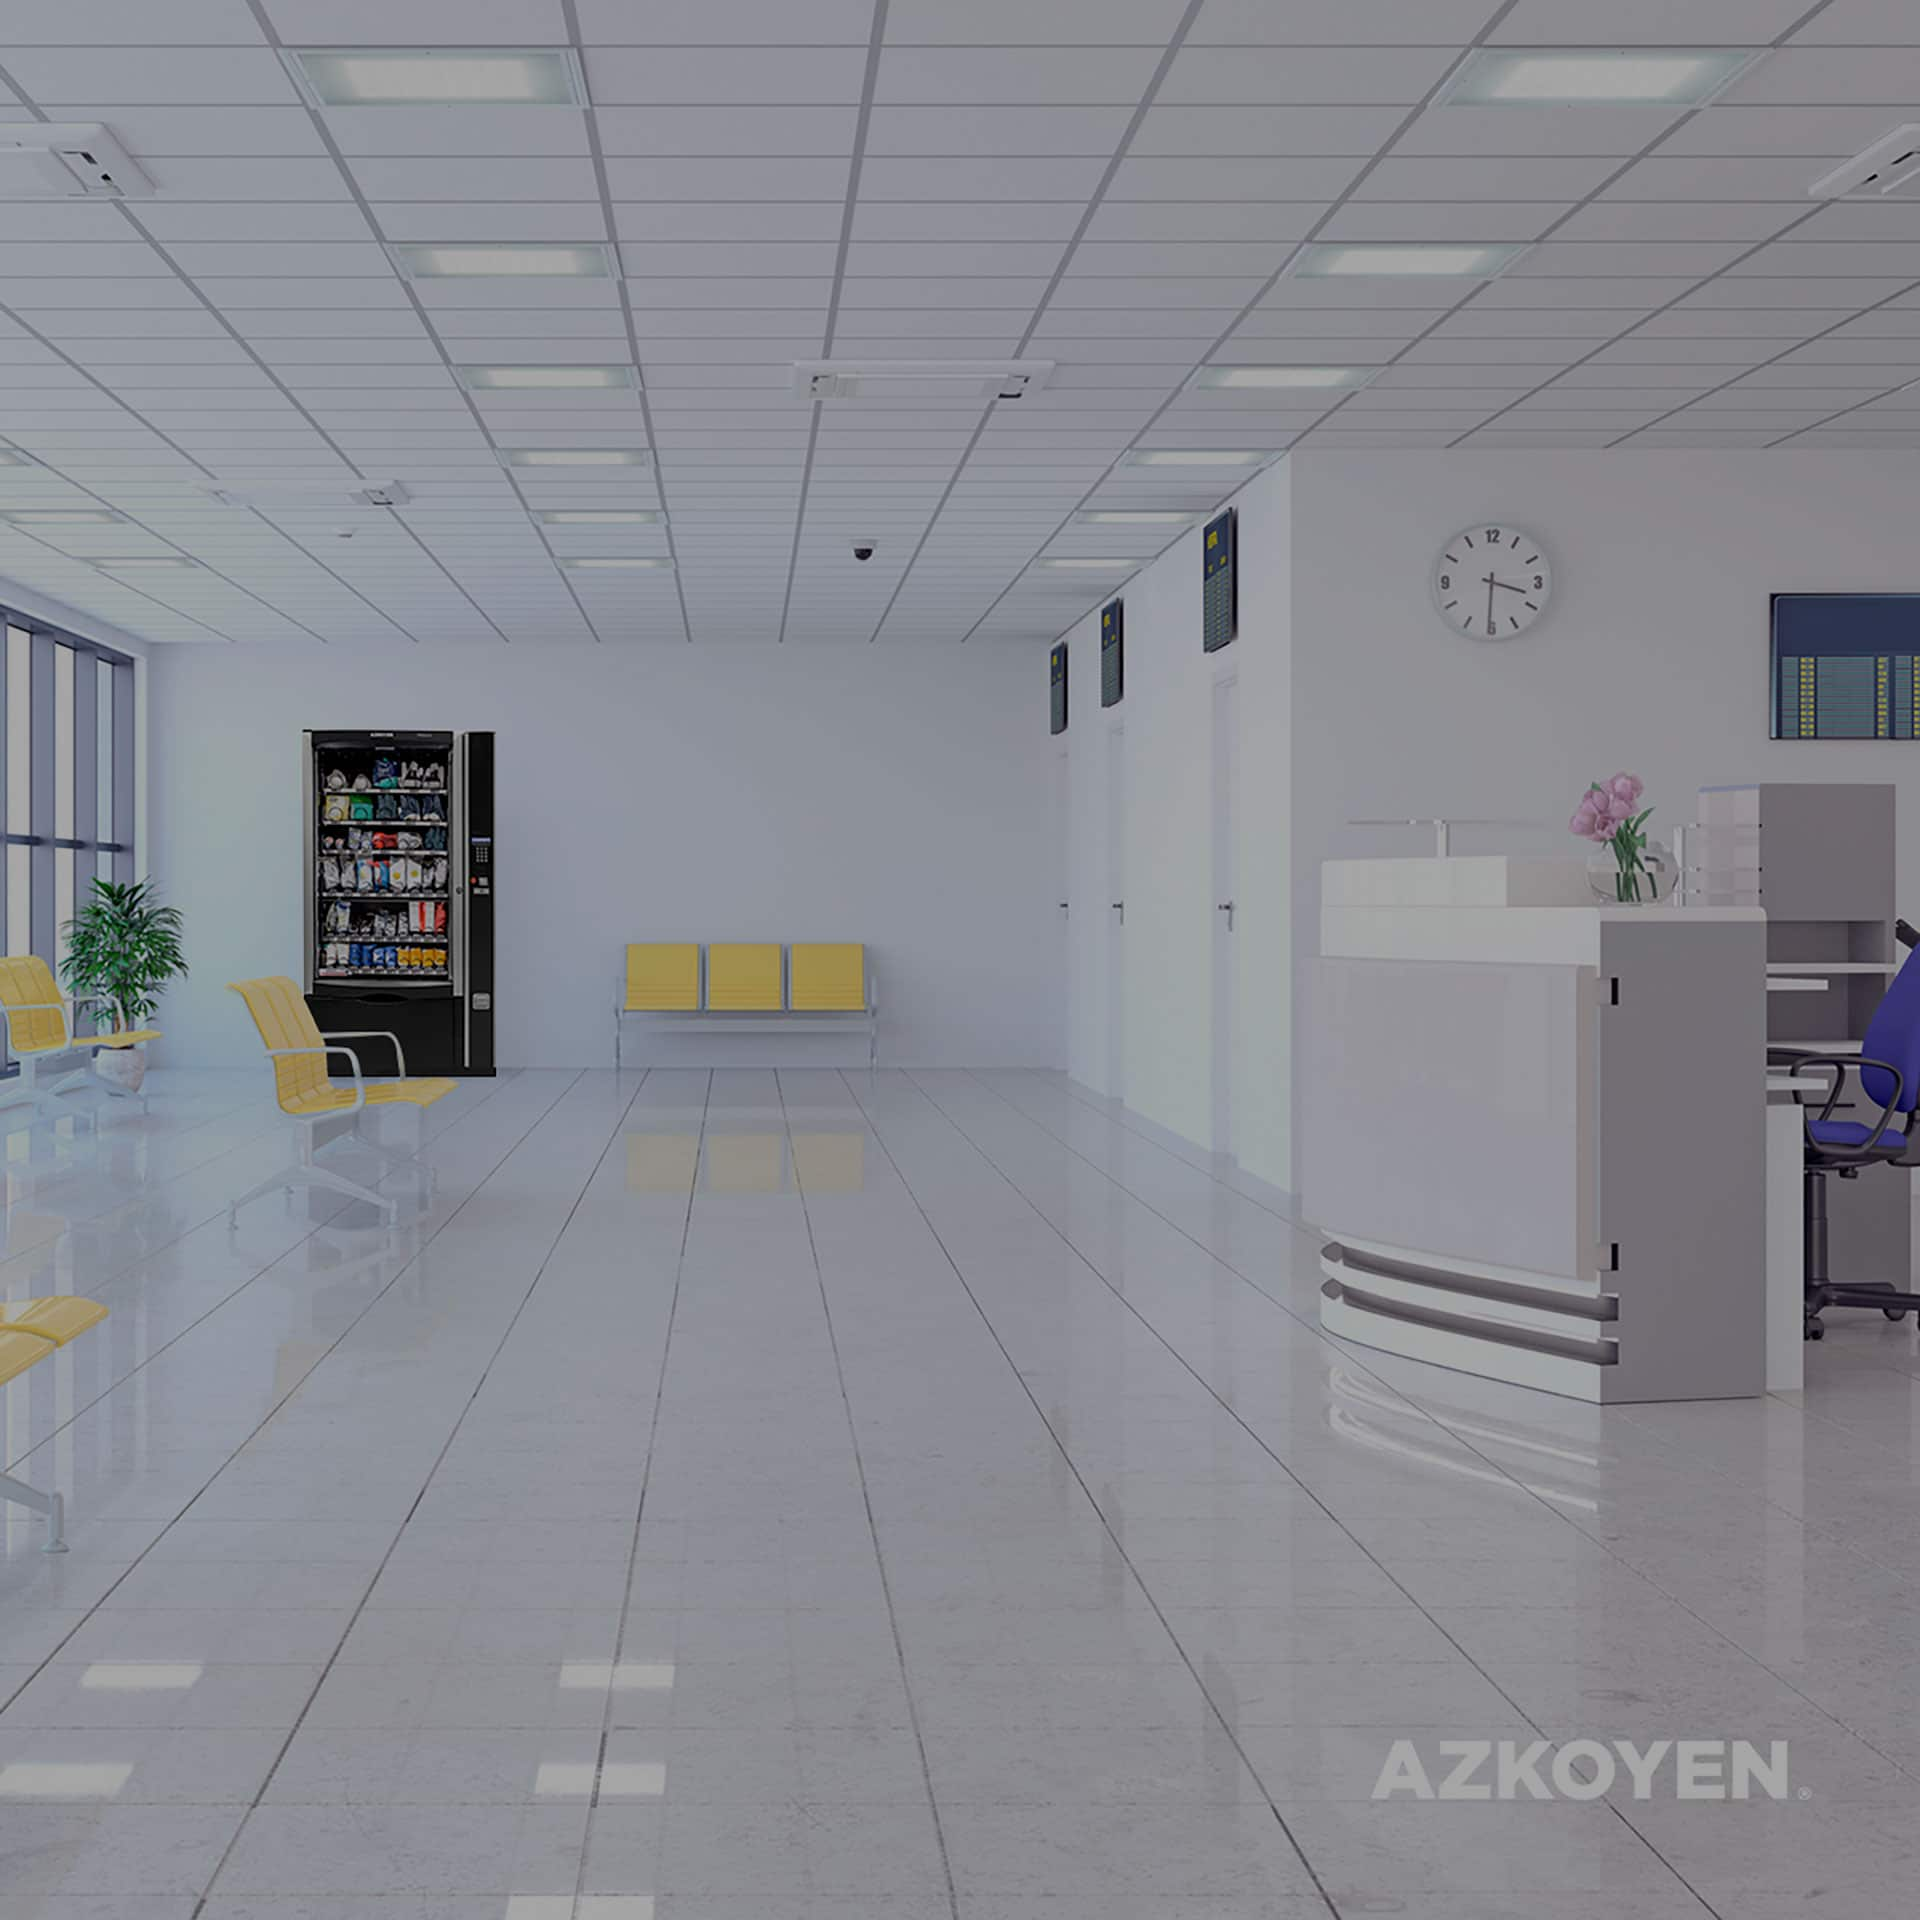 Azkoyen colabora en la distribución de EPIs a través de sus máquinas automáticas